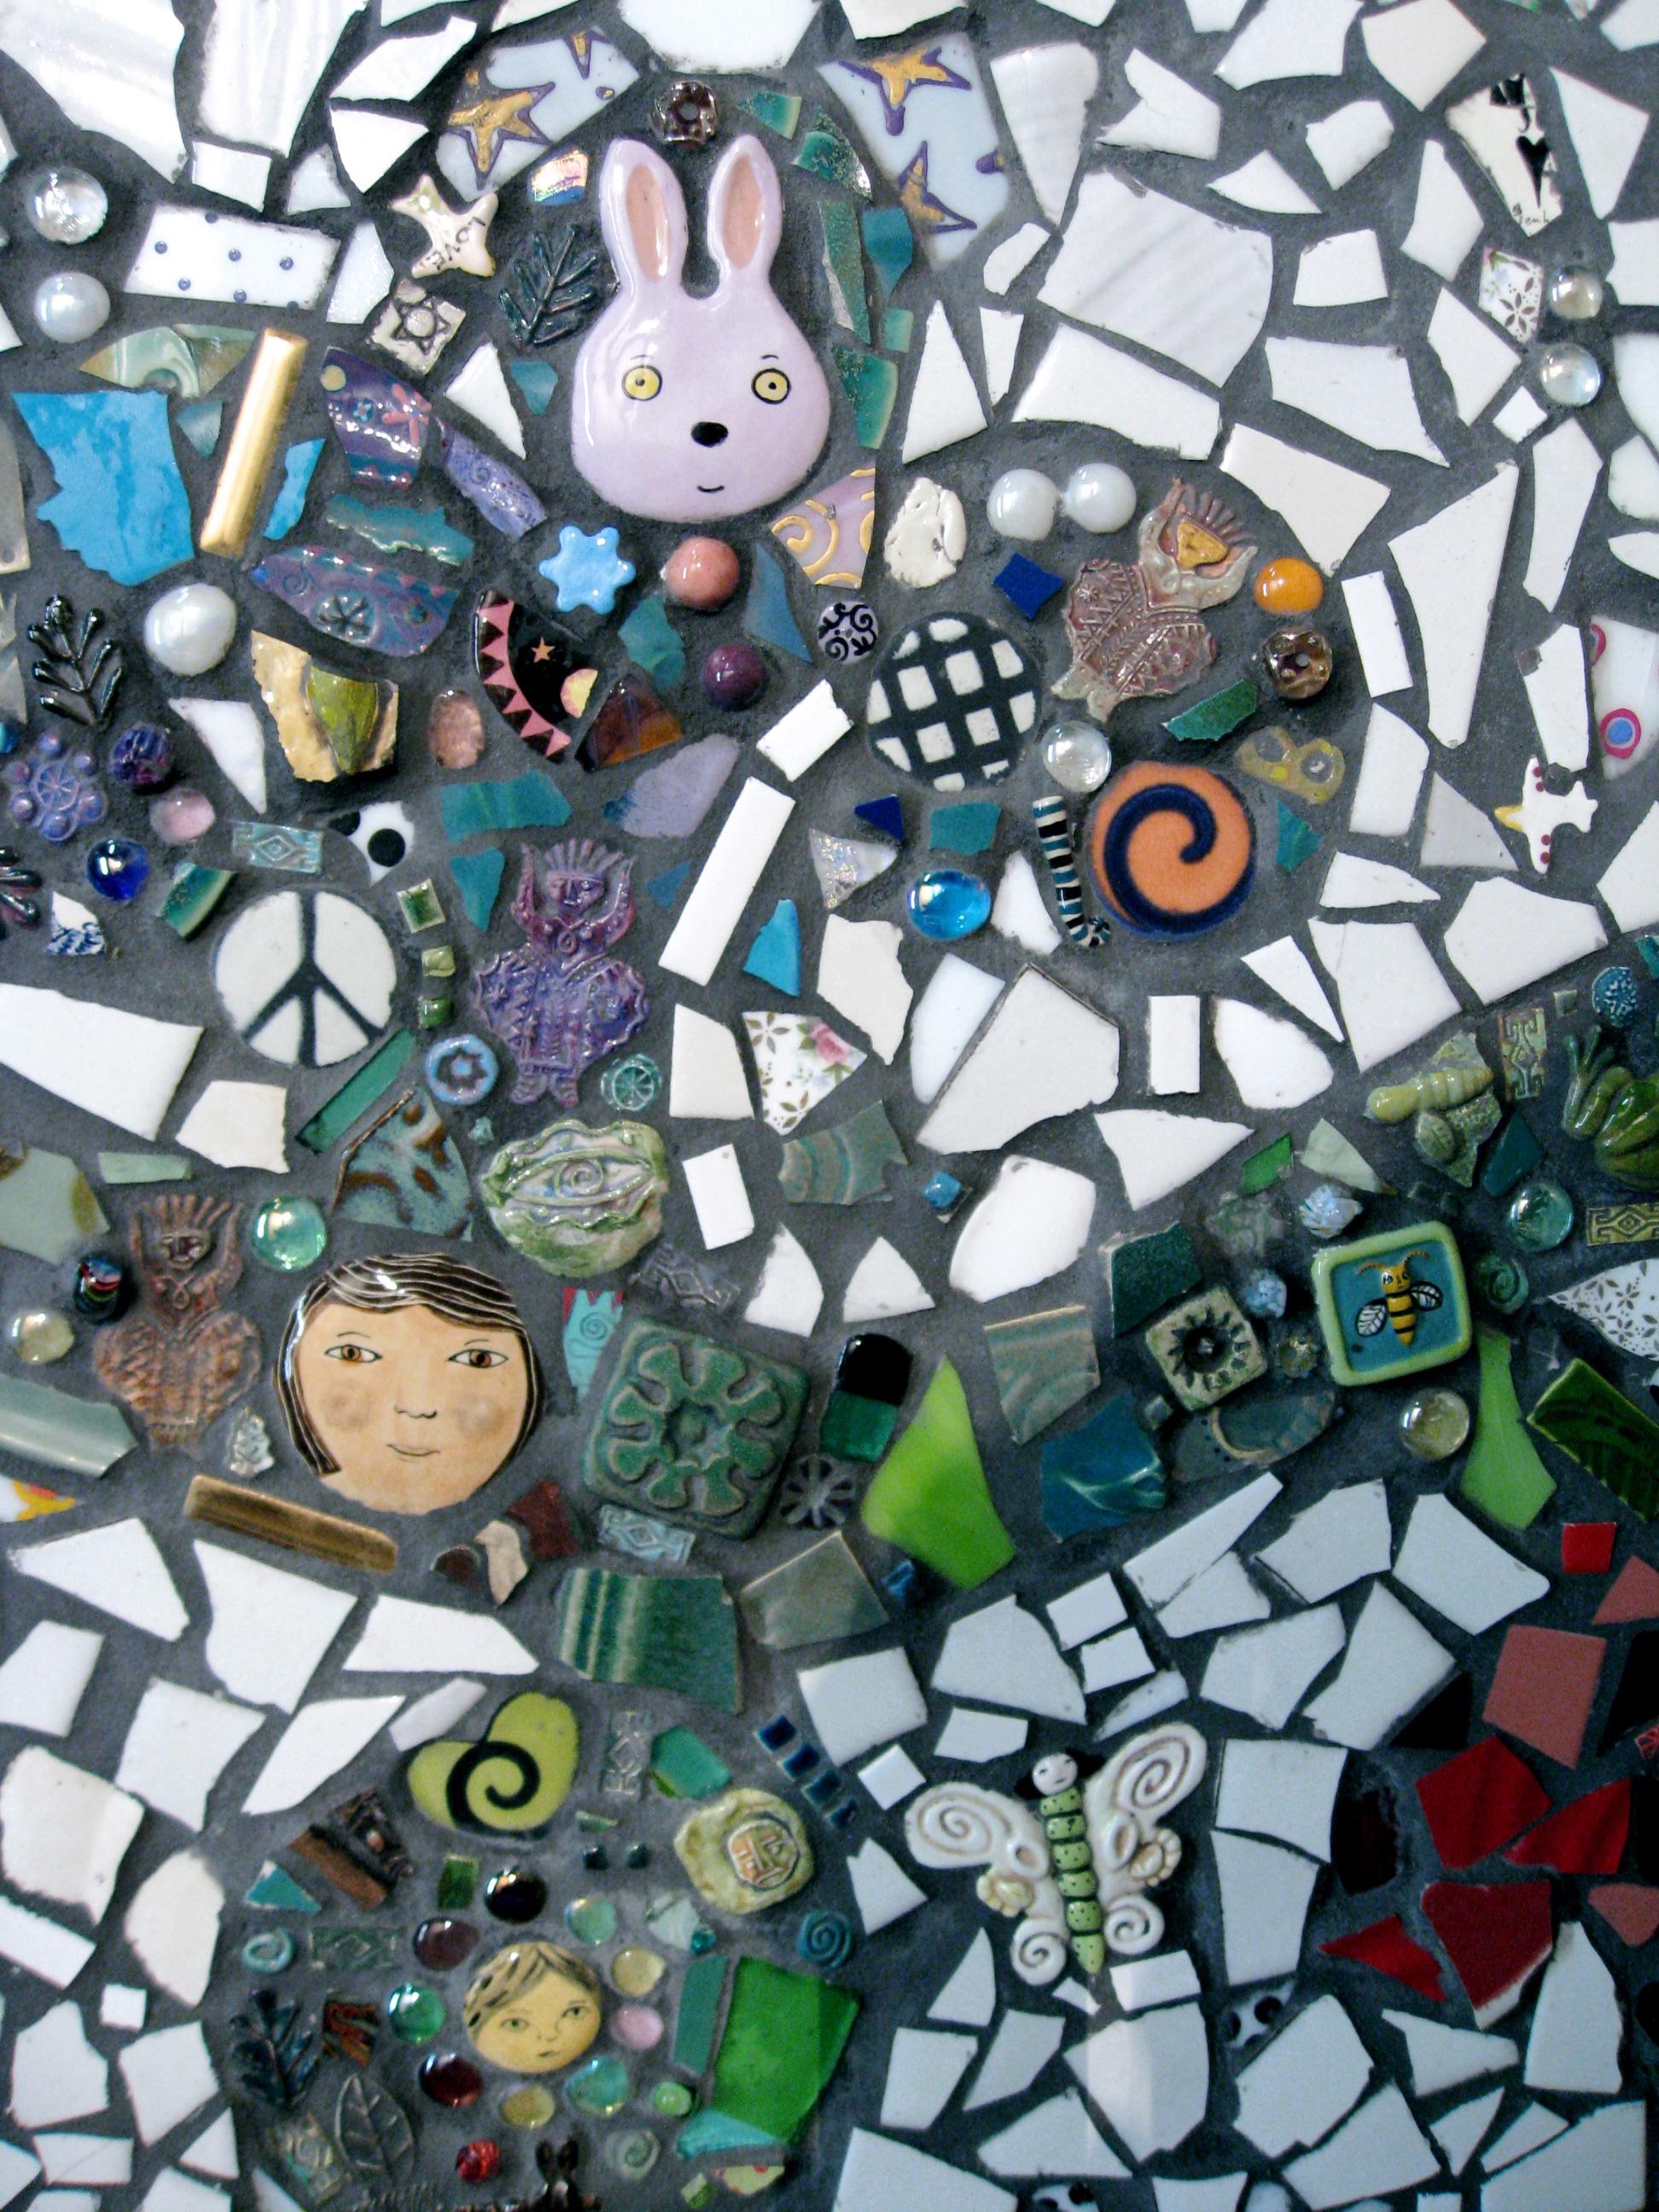 Mosaic CLose Up.jpg